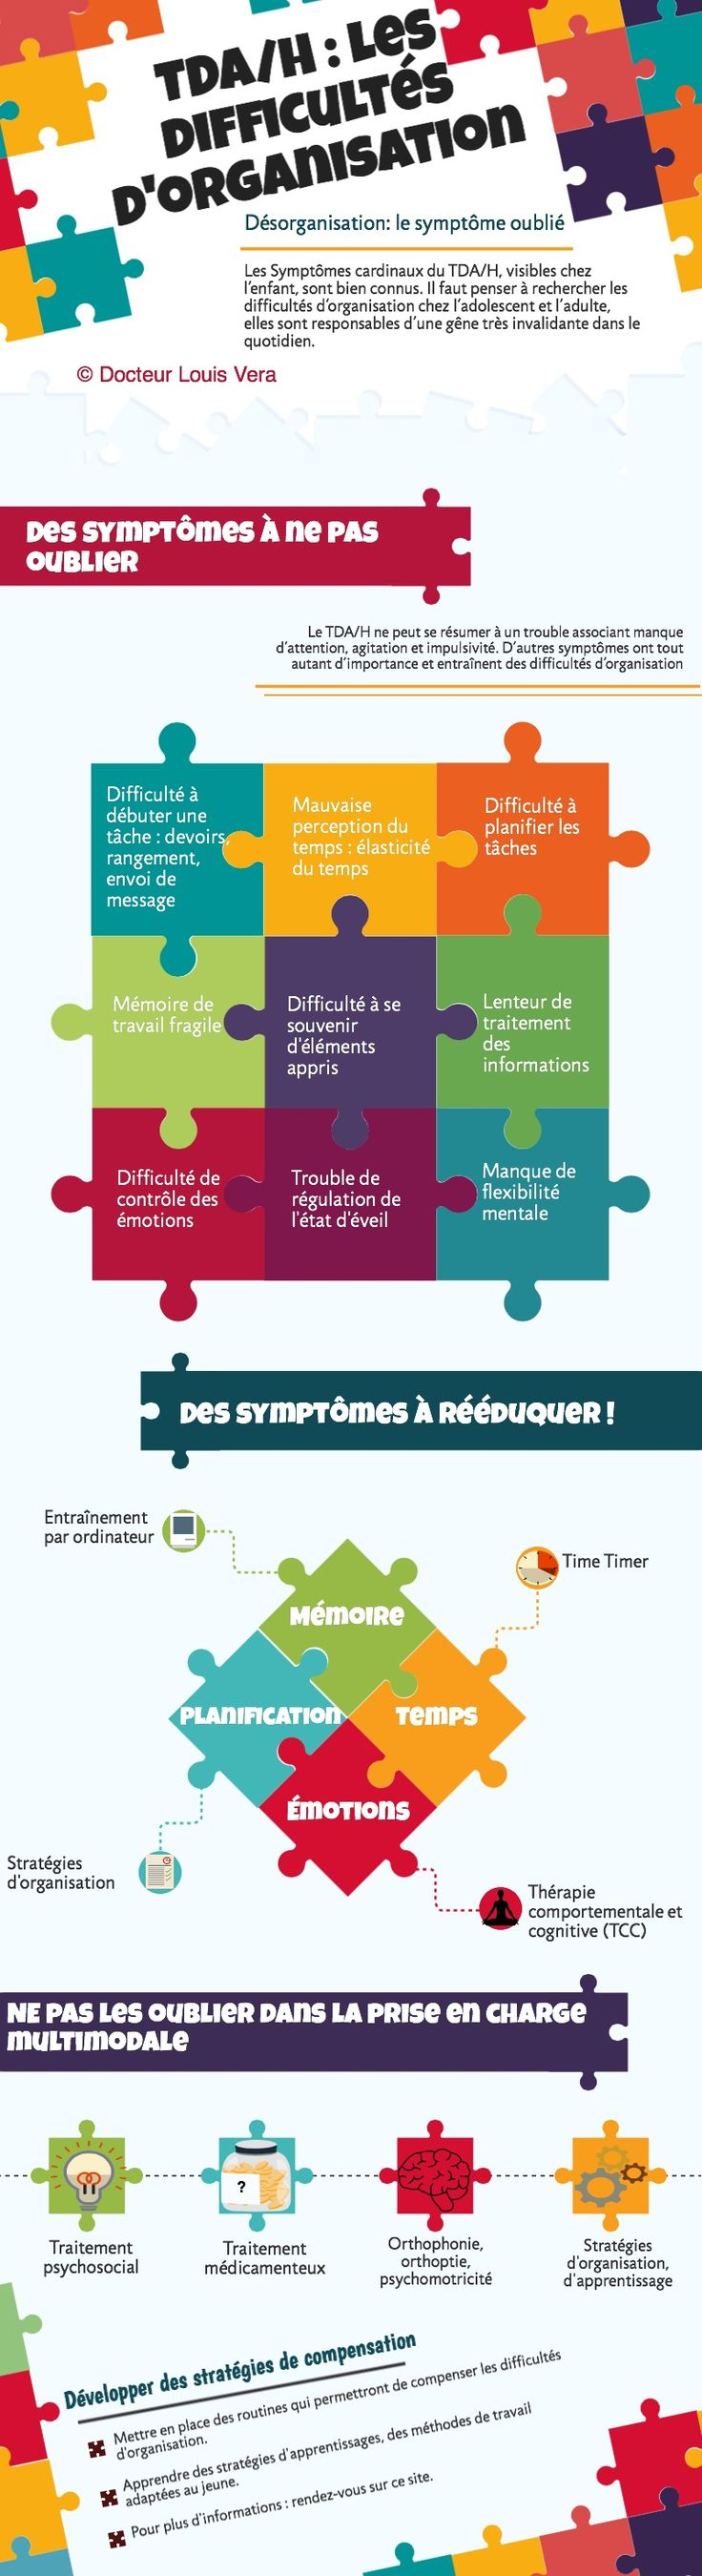 TDA/H et désorganisation | @Piktochart Infographic